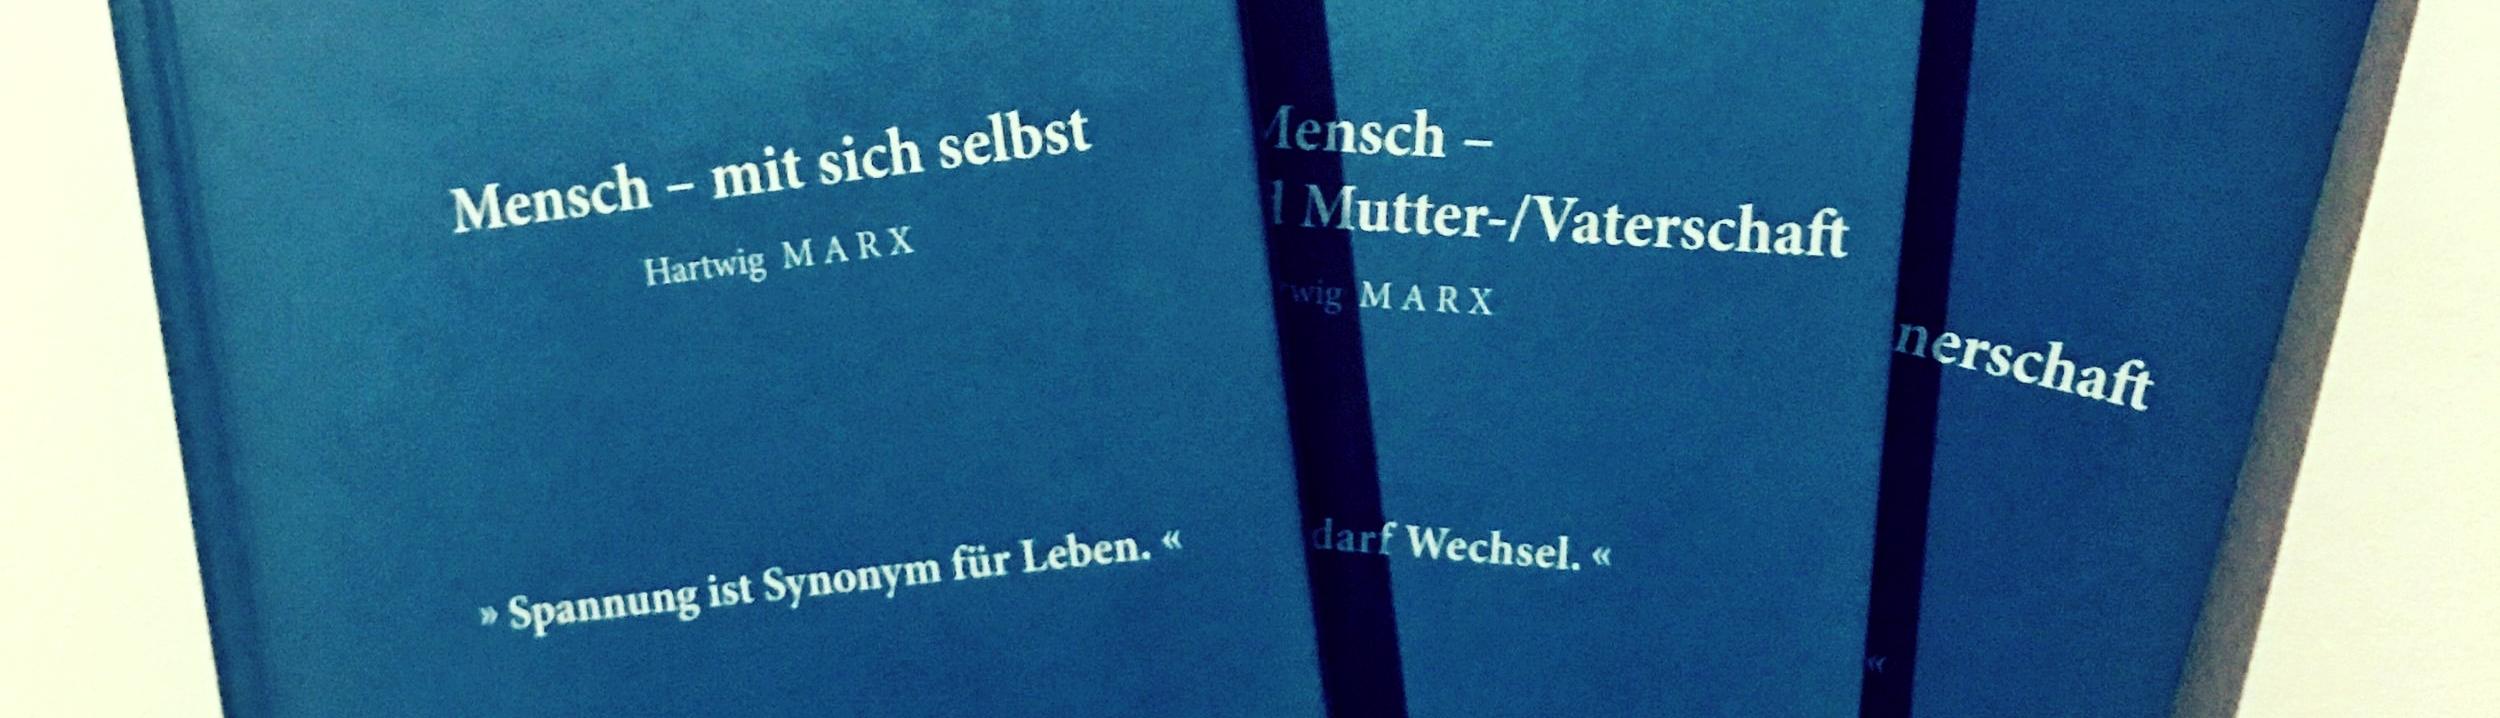 Buchreihe Mensch.jpeg